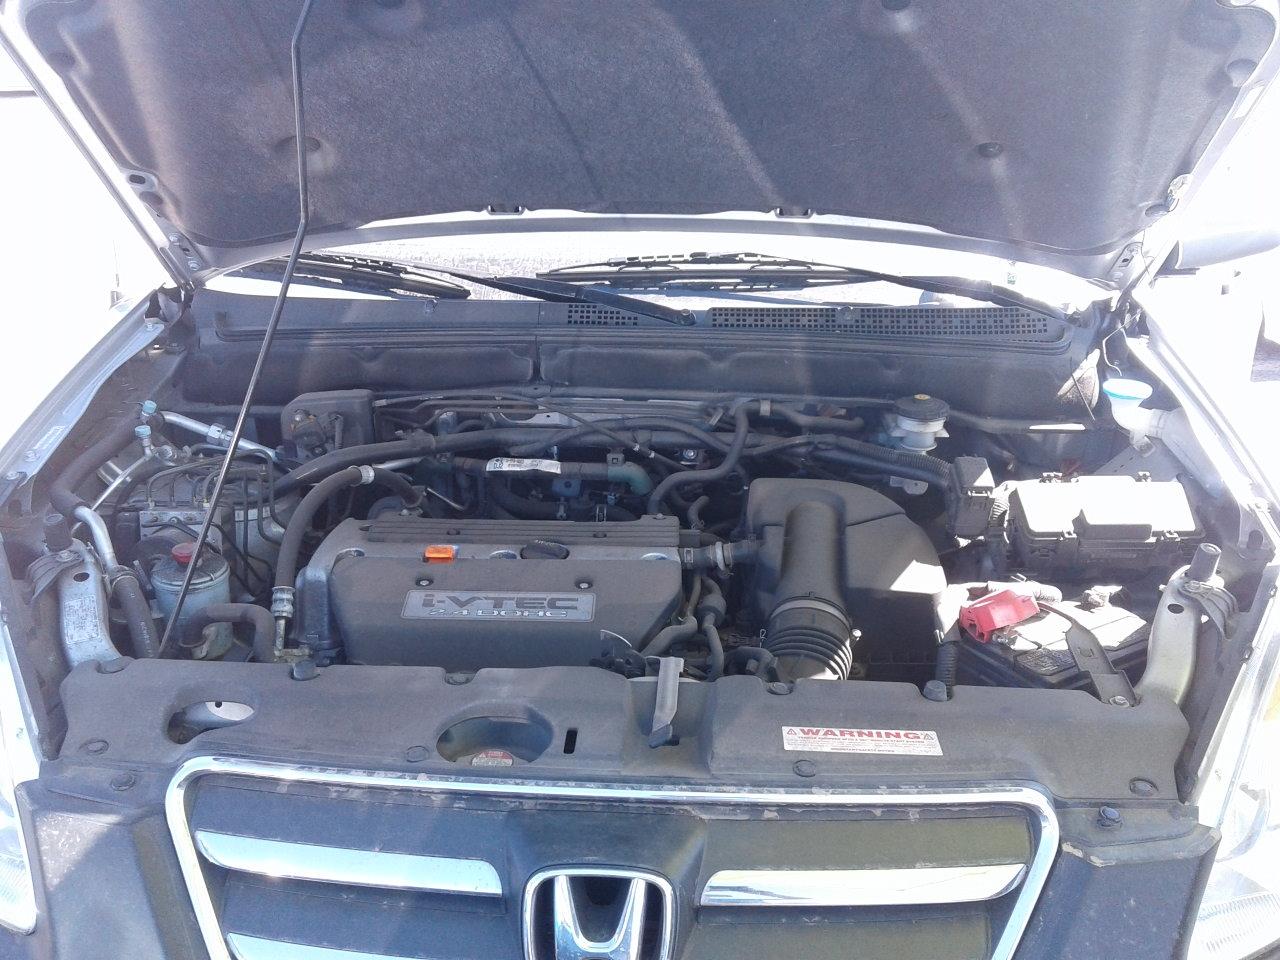 2005 Honda Element Horn Diagram Schematics 2010 Fuse Crv Used Heater Core 194709466 Fuel Pump Relay